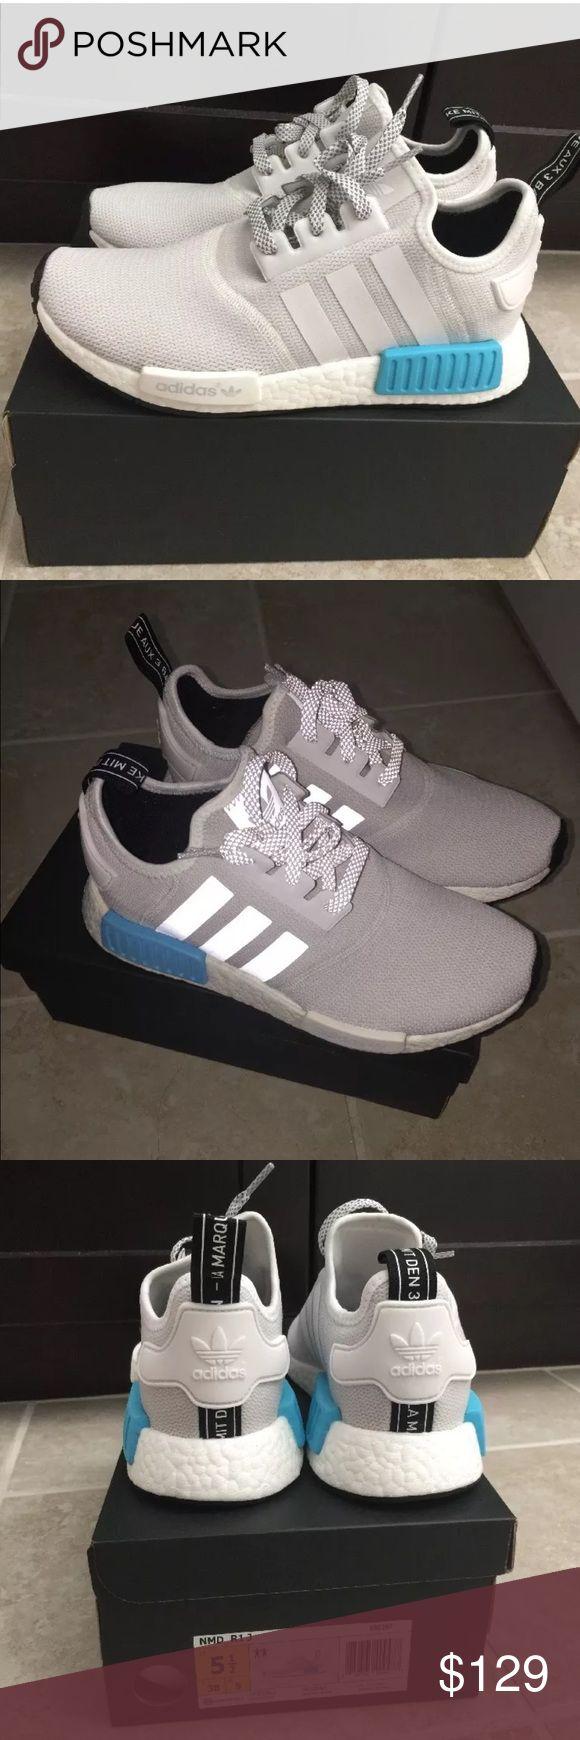 "Adidas Nmd R1 ""wool 11 from Adam's closet on Poshmark"